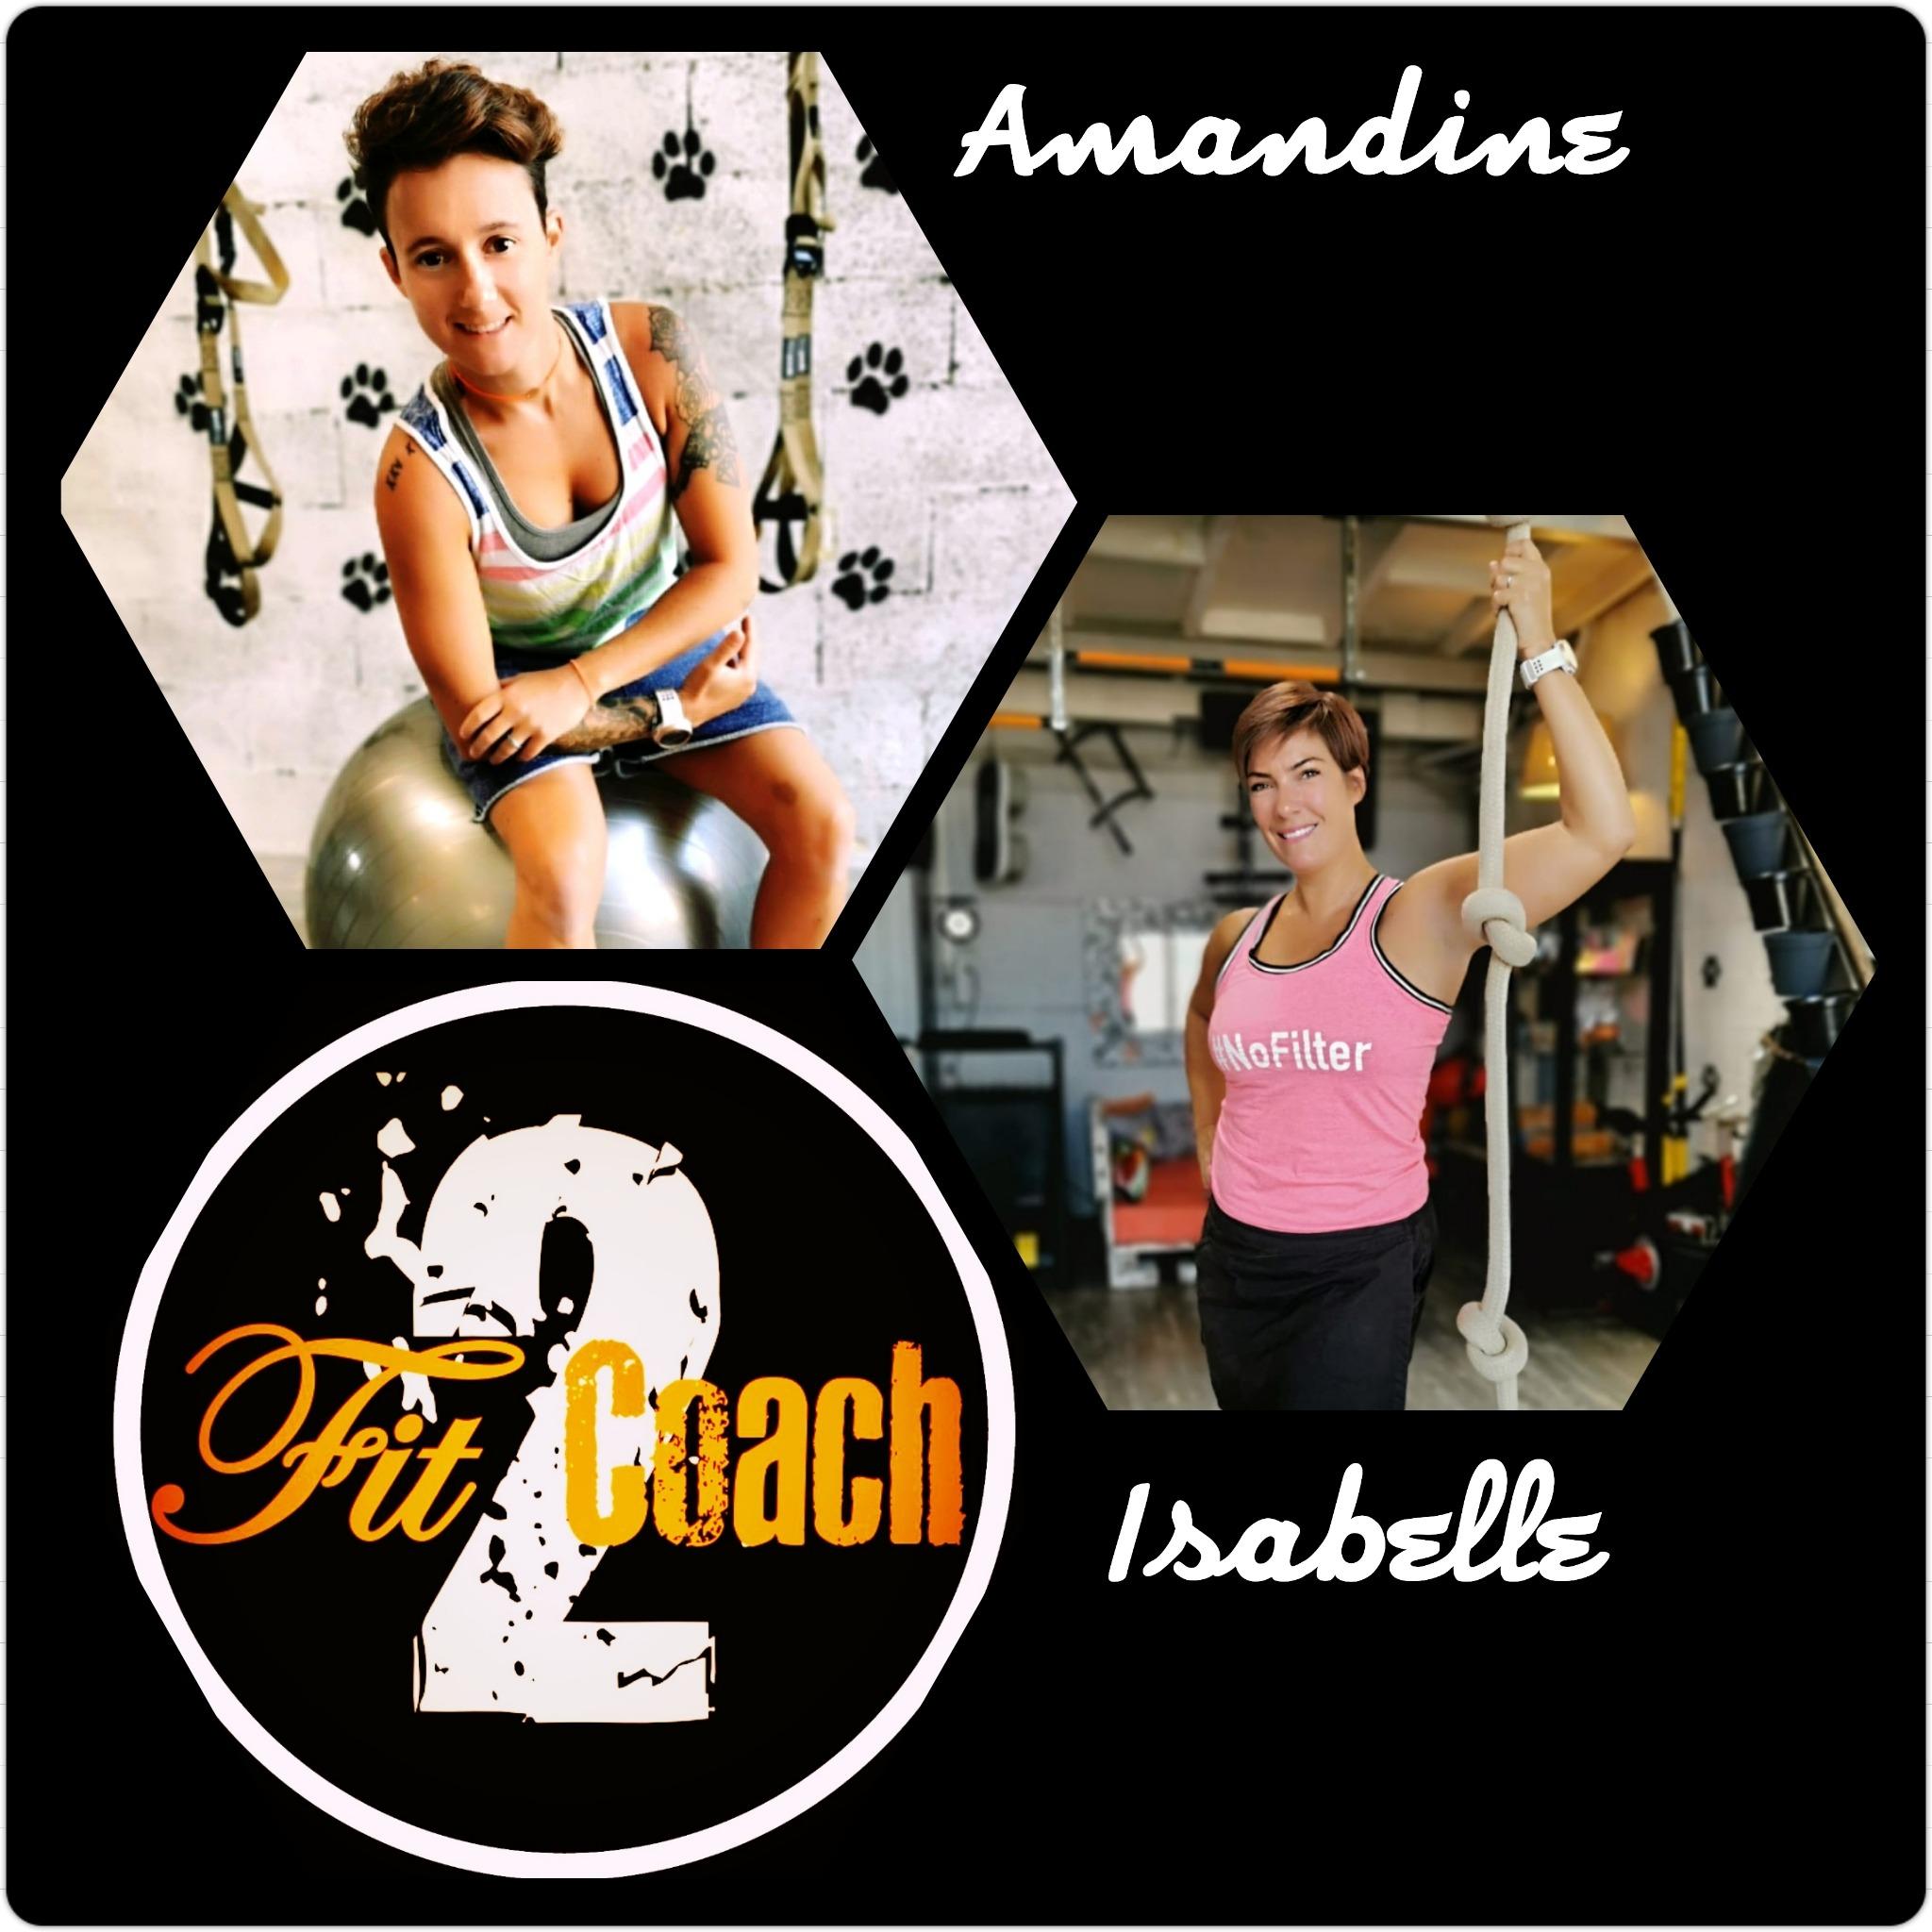 Amandine & Isabelle